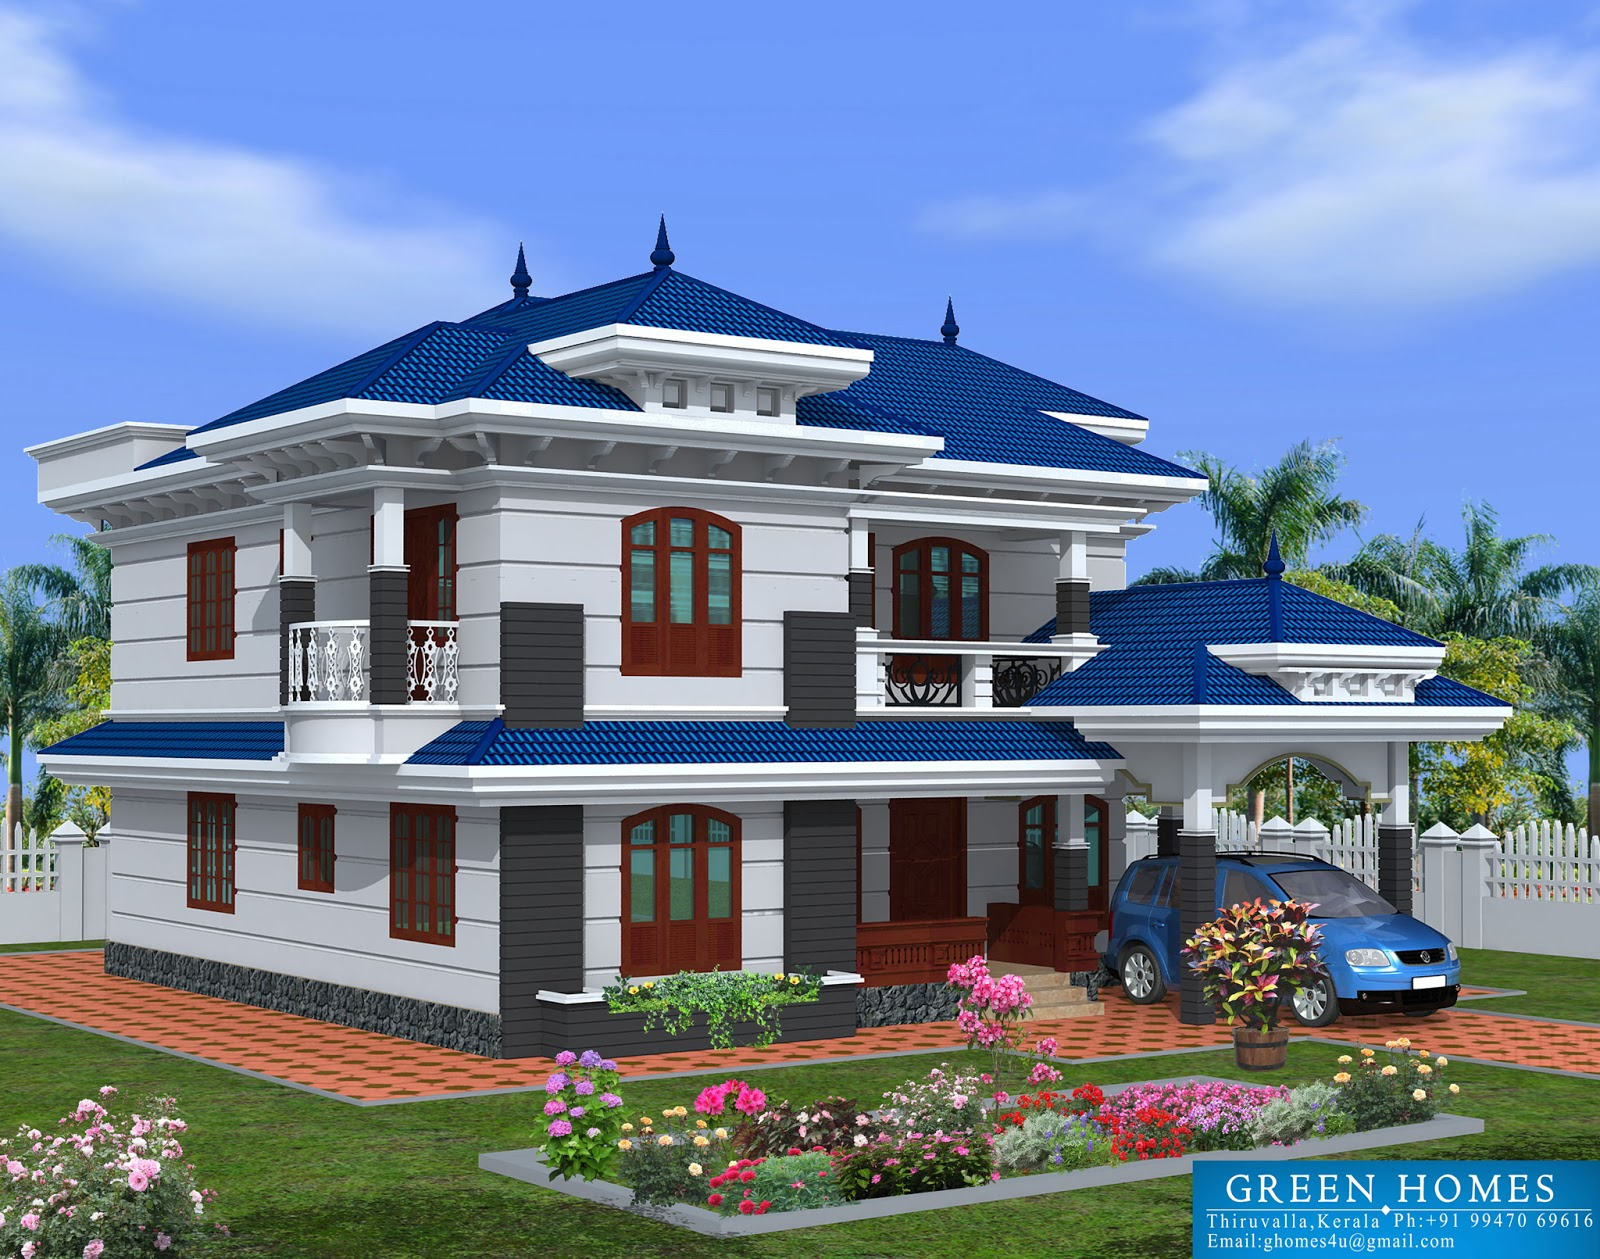 Green Homes: Beautiful Kerala Home Design-2222Sq.feet on Beautiful Home Decor  id=45086